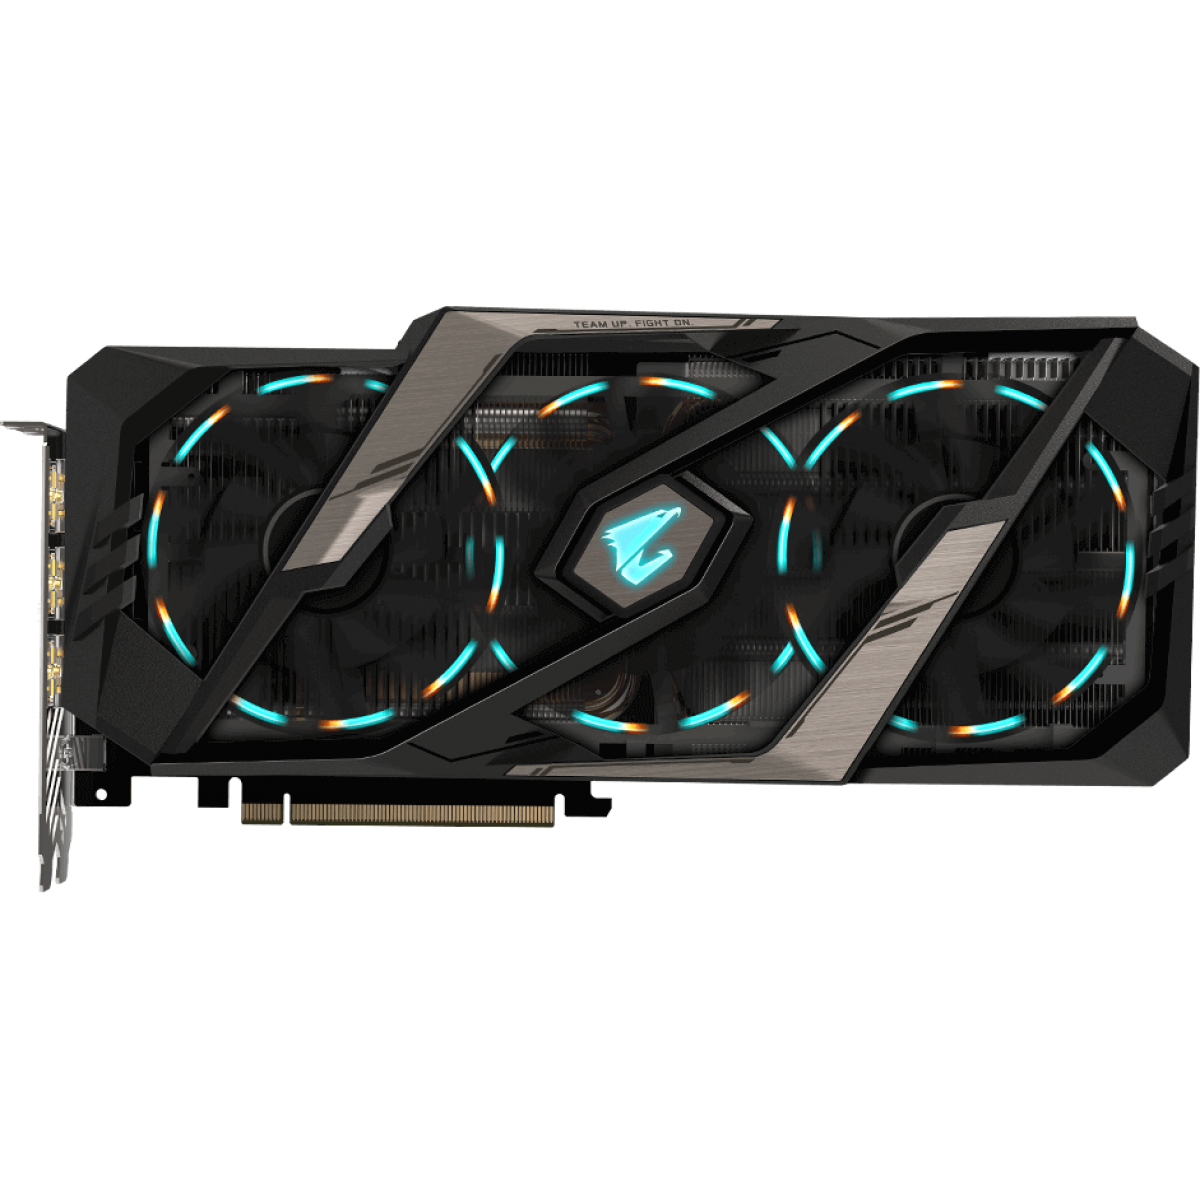 Placa De Vídeo Gigabyte Geforce RTX 2080 Ti Xtreme, 11GB GDDR6, 352Bit, GV-N208TAORUS X-11GC